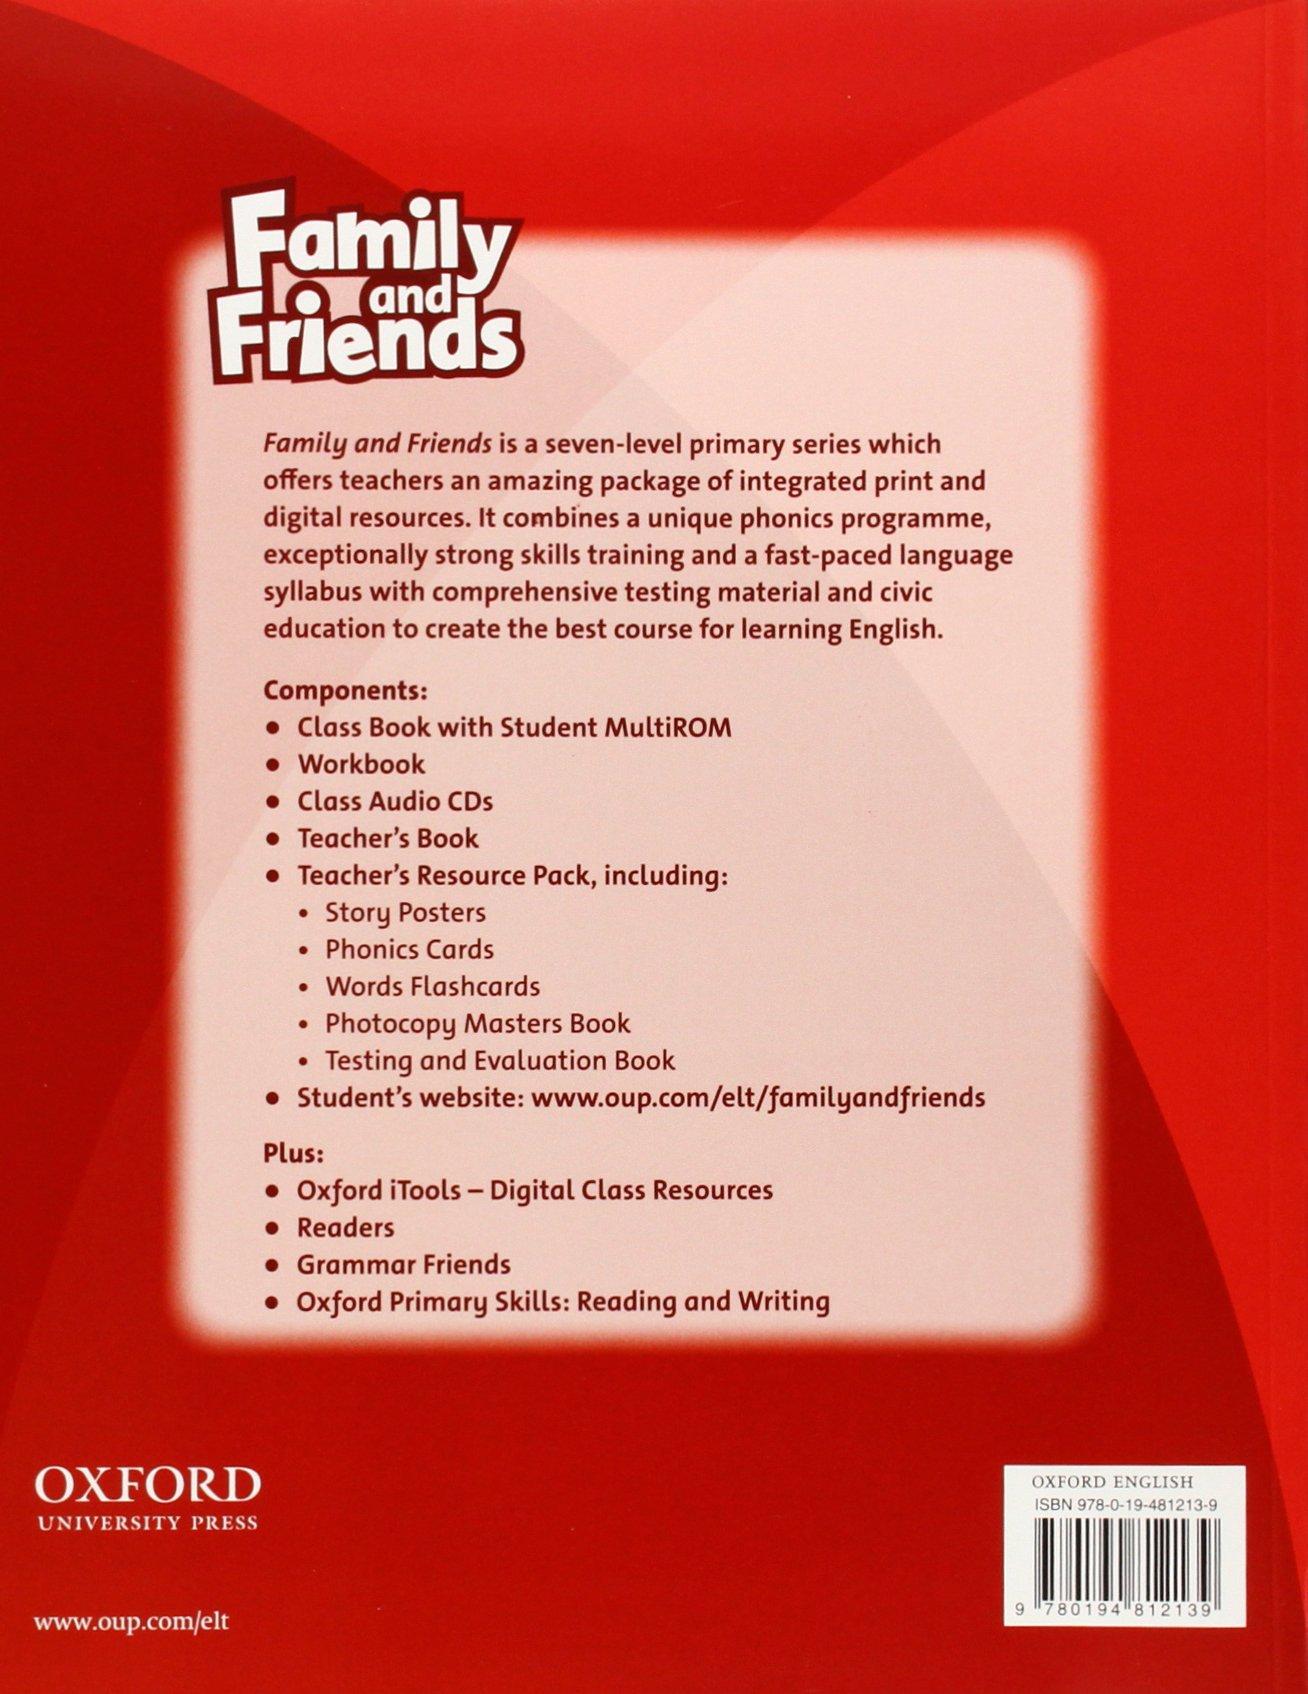 Family and friends 4 audio class cd скачать бесплатно